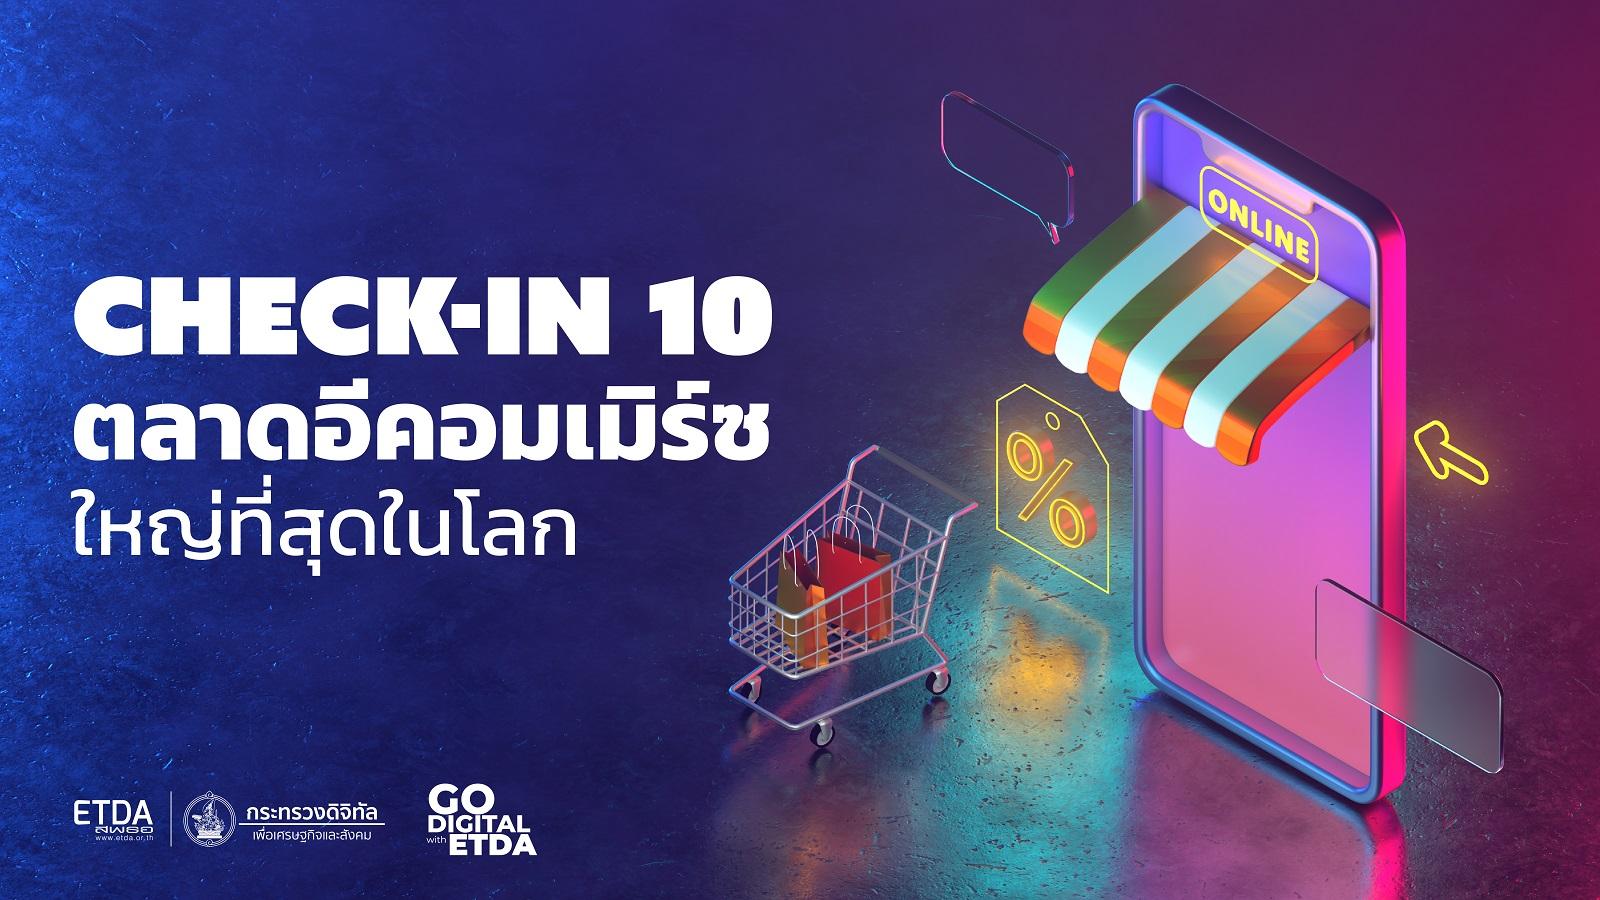 Check-in 10 ตลาดอีคอมเมิร์ซ ใหญ่ที่สุดในโลก